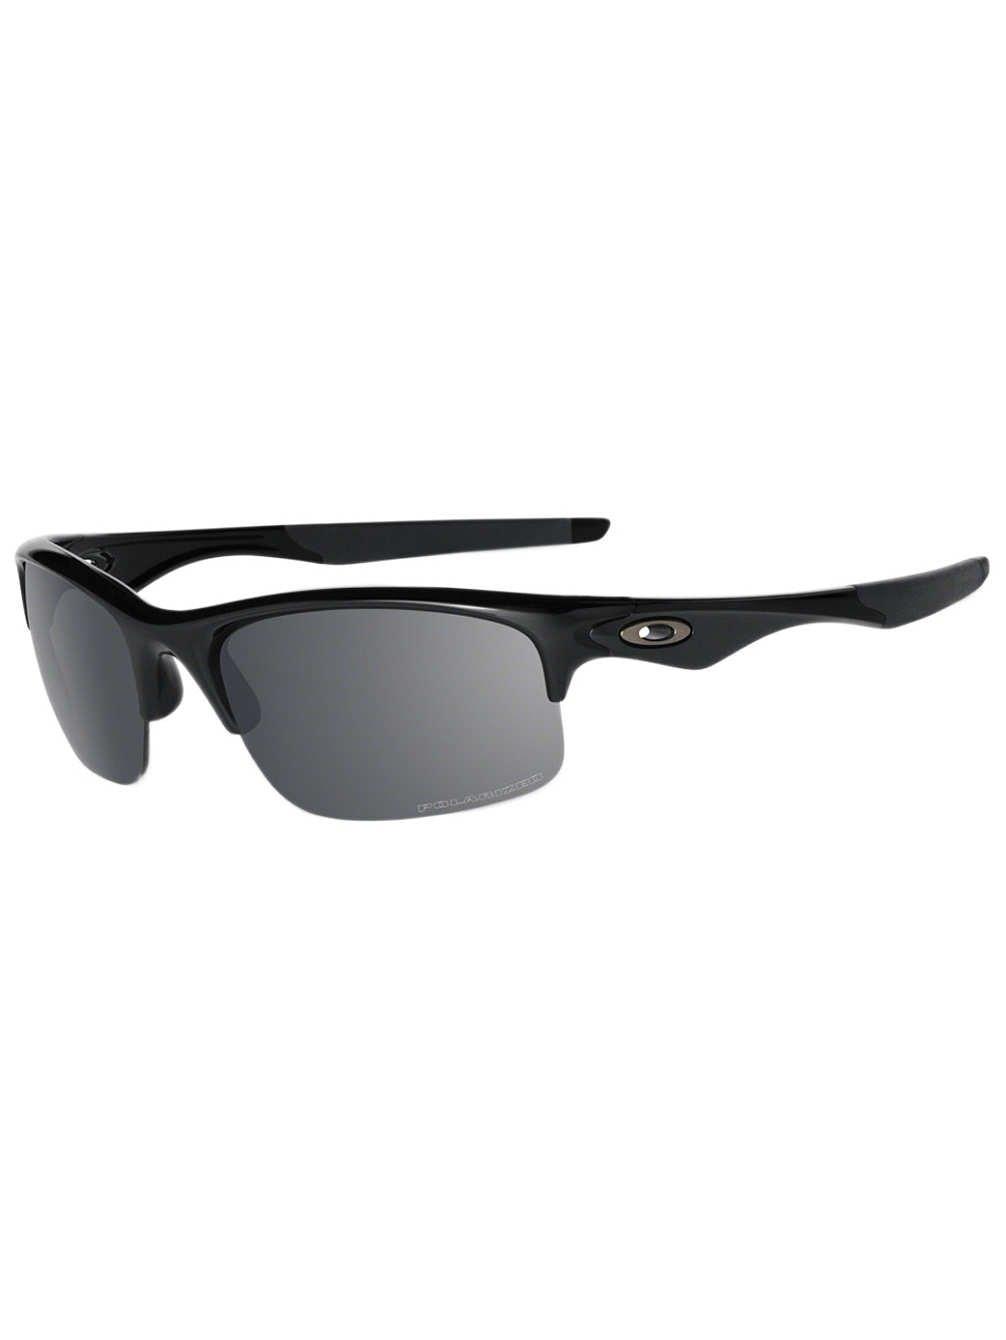 Oakley Bottle Rocket Men's Polarized Active Sports Sunglasses/Eyewear - Polished Black/Black Iridium/One Size Fits All by Oakley